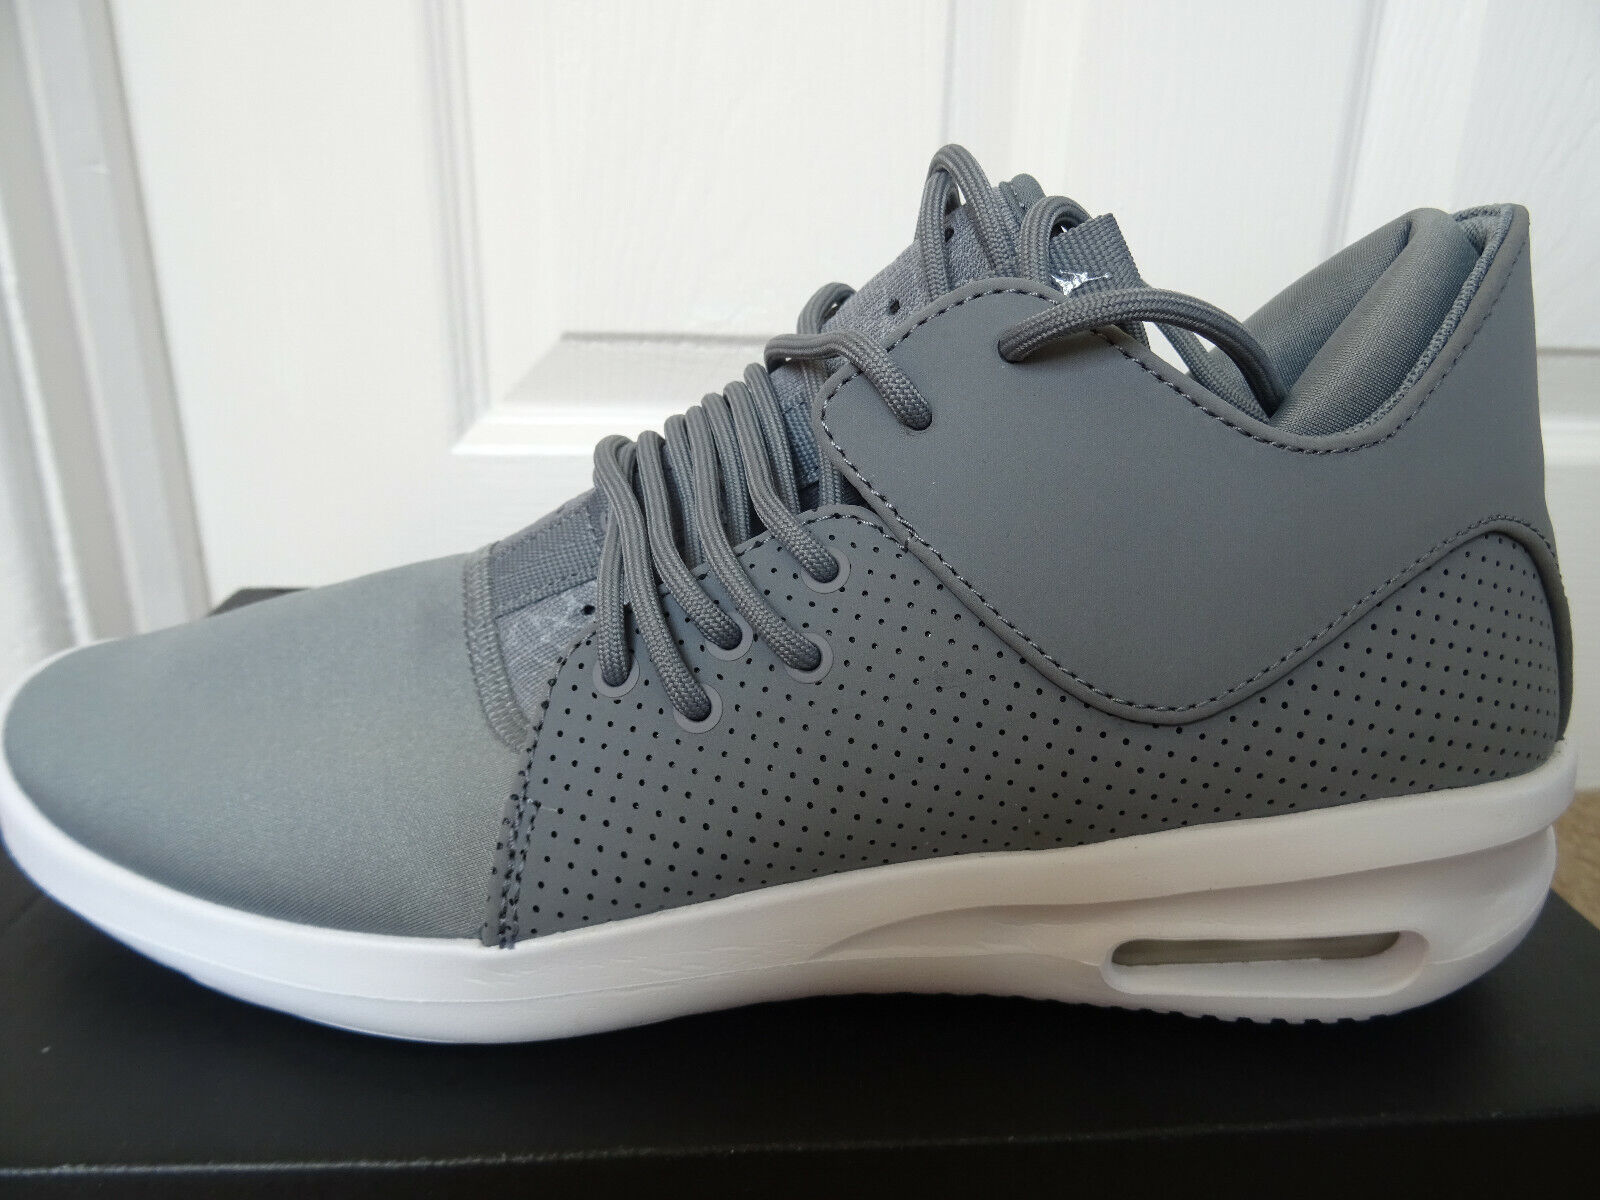 Nike Jordan First Class trainers schuhe AJ7312 003 uk 7.5 eu 42 us 8.5 NEW+BOX